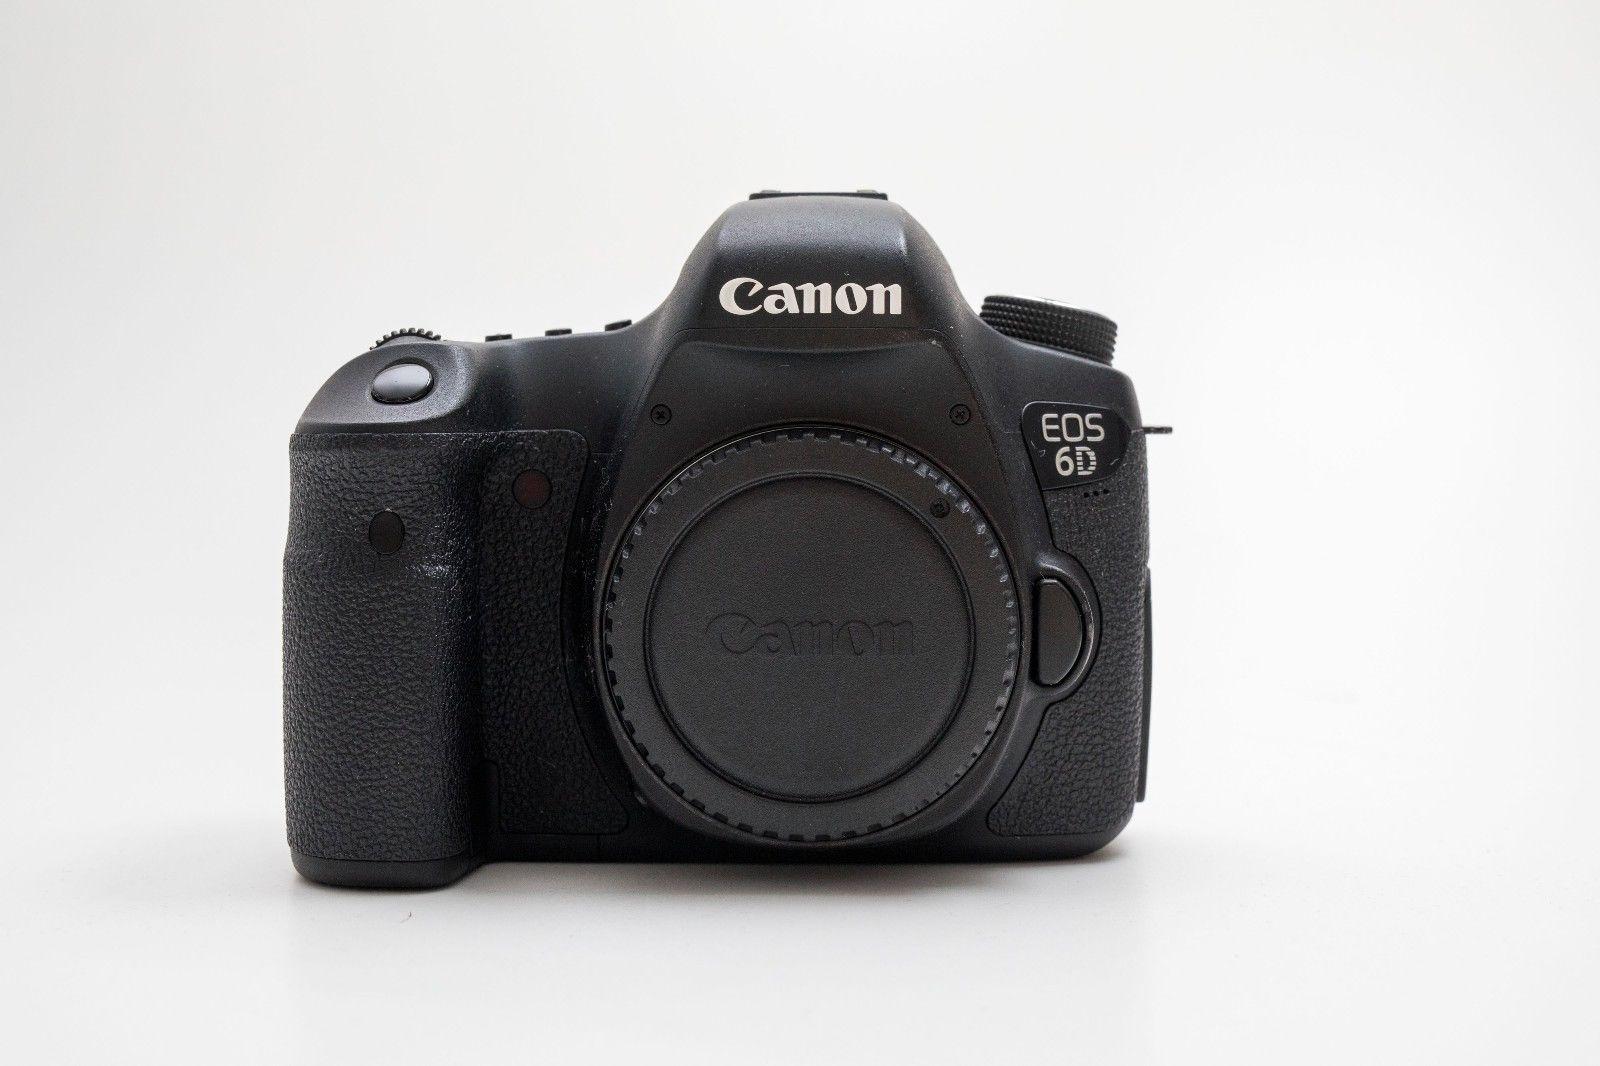 Canon EOS 6D 20,2 MP VOLLFORMAT SLR- - GPS/WLAN Body ca. 15.500 Auslösungen